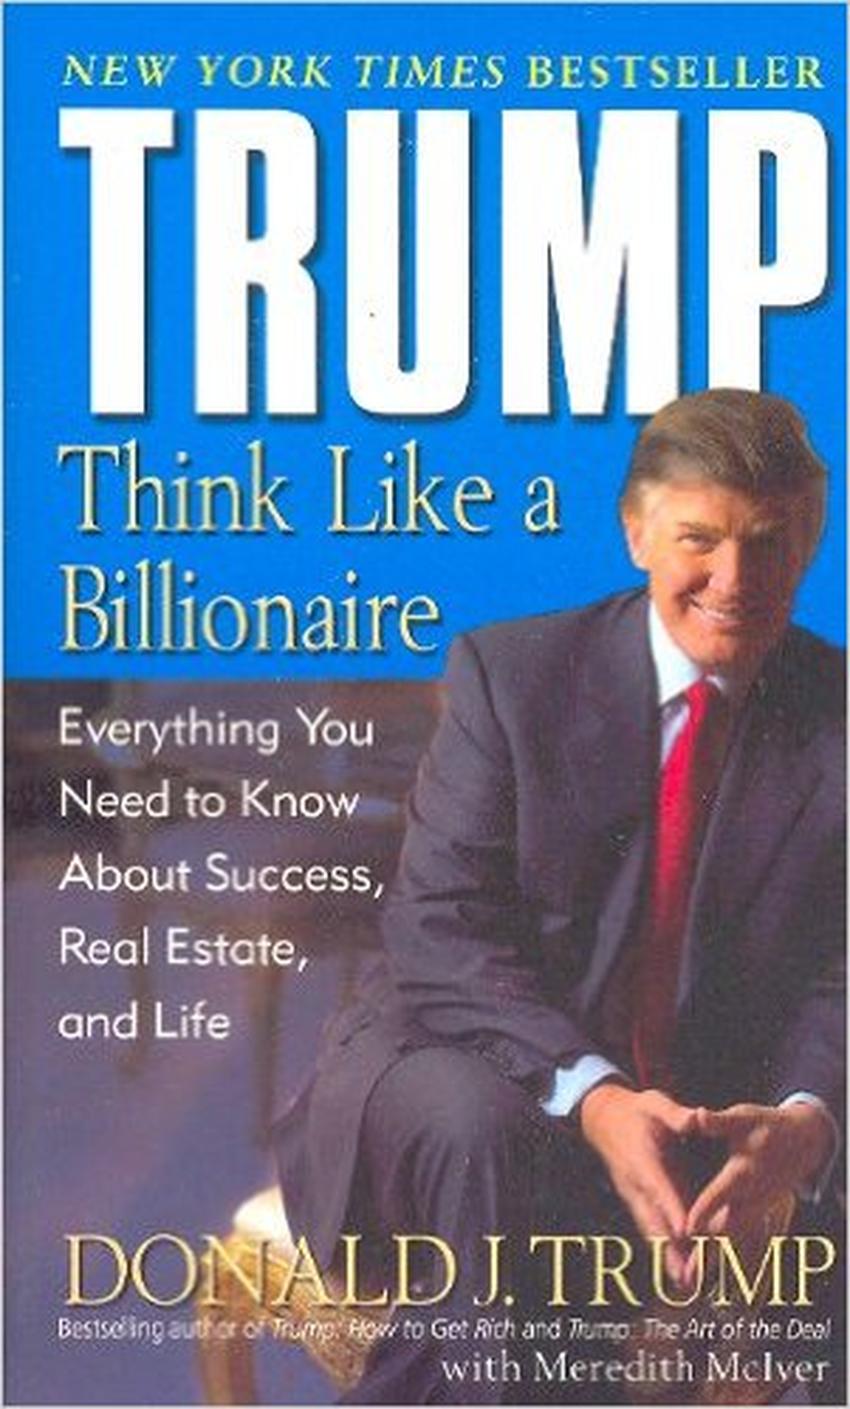 Trump: Think Like a Billionaire, Donald J. Trump com Meredith McIver (Random House, 2004)